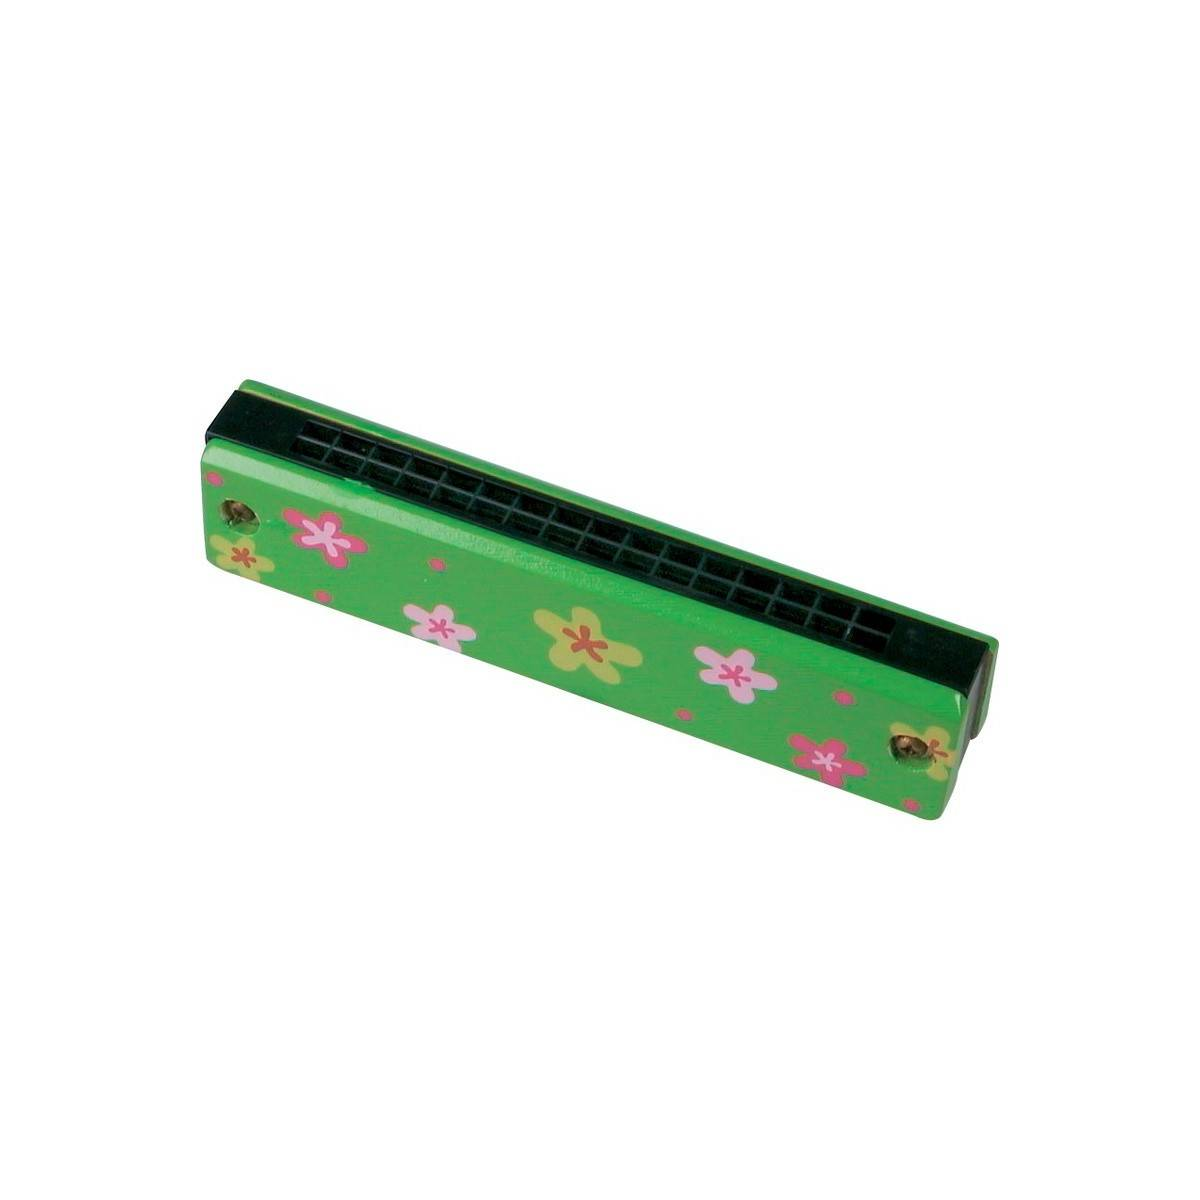 harmonica bois multicolore neuf ebay. Black Bedroom Furniture Sets. Home Design Ideas